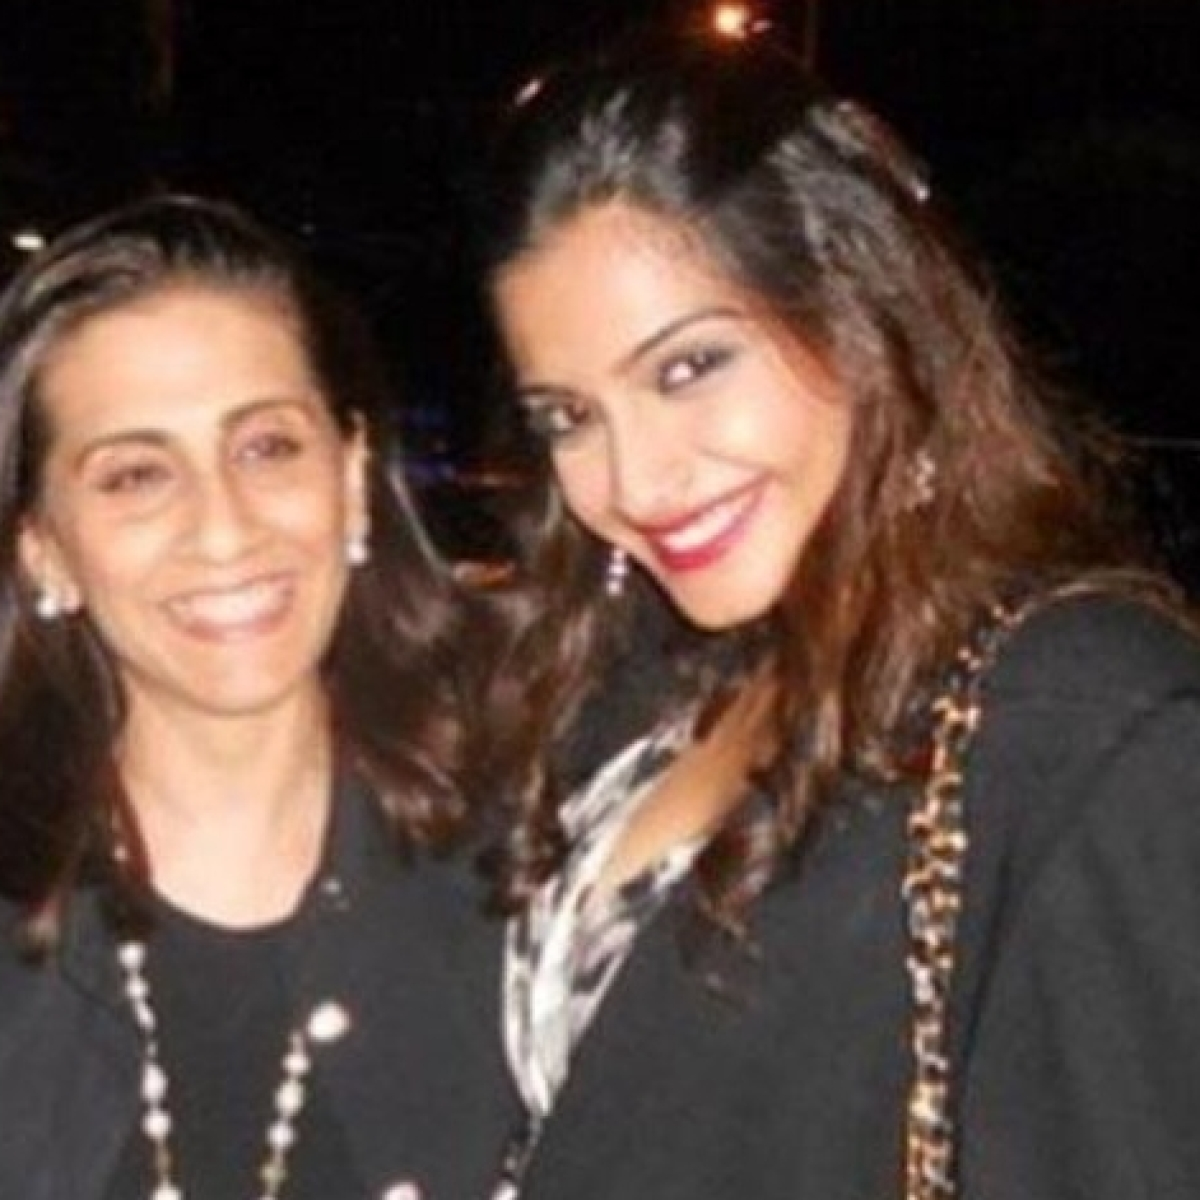 'I'm lucky to call myself your daughter': Sonam Kapoor's birthday wish for mom Sunita